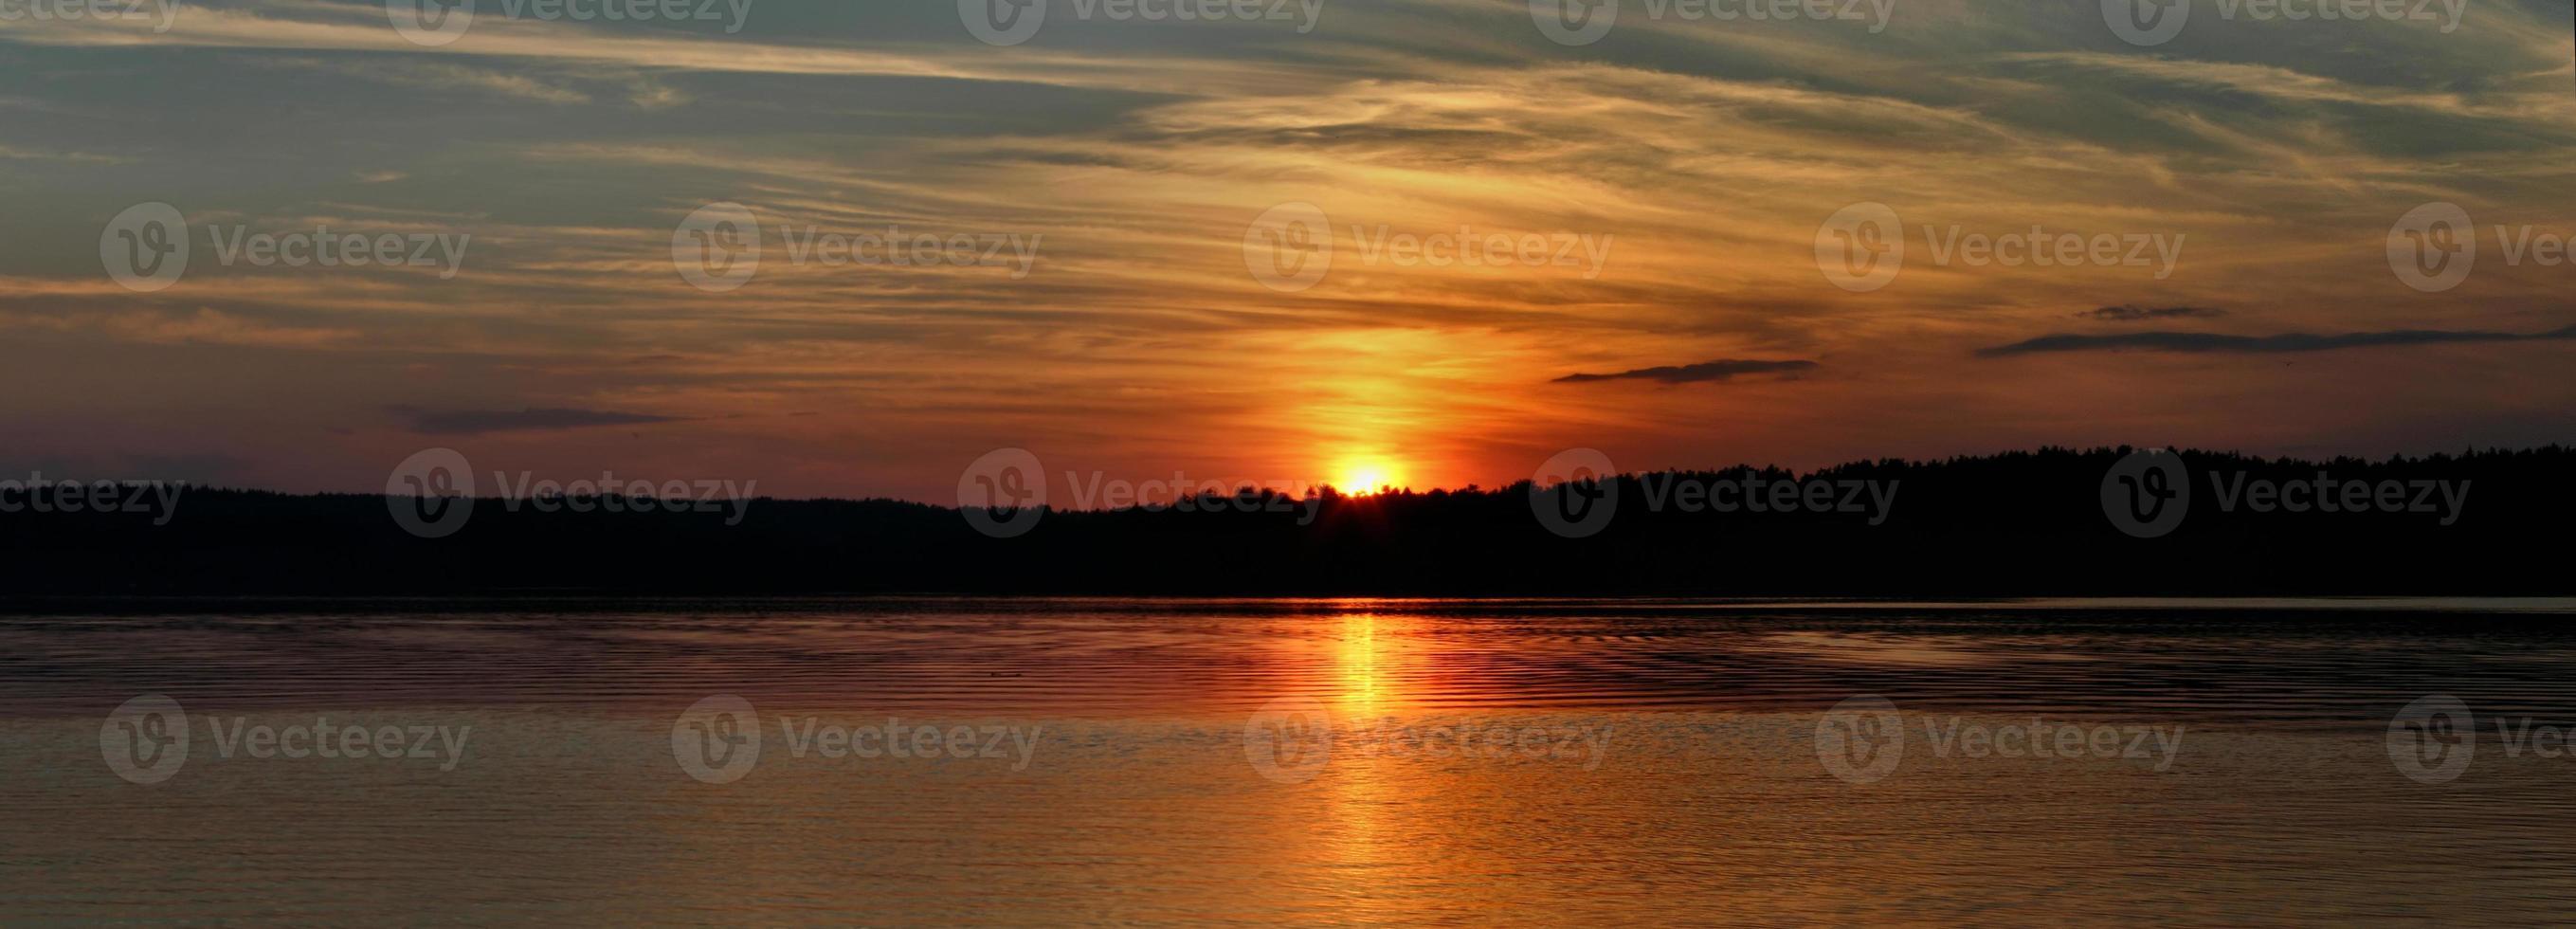 sunset panorama photo